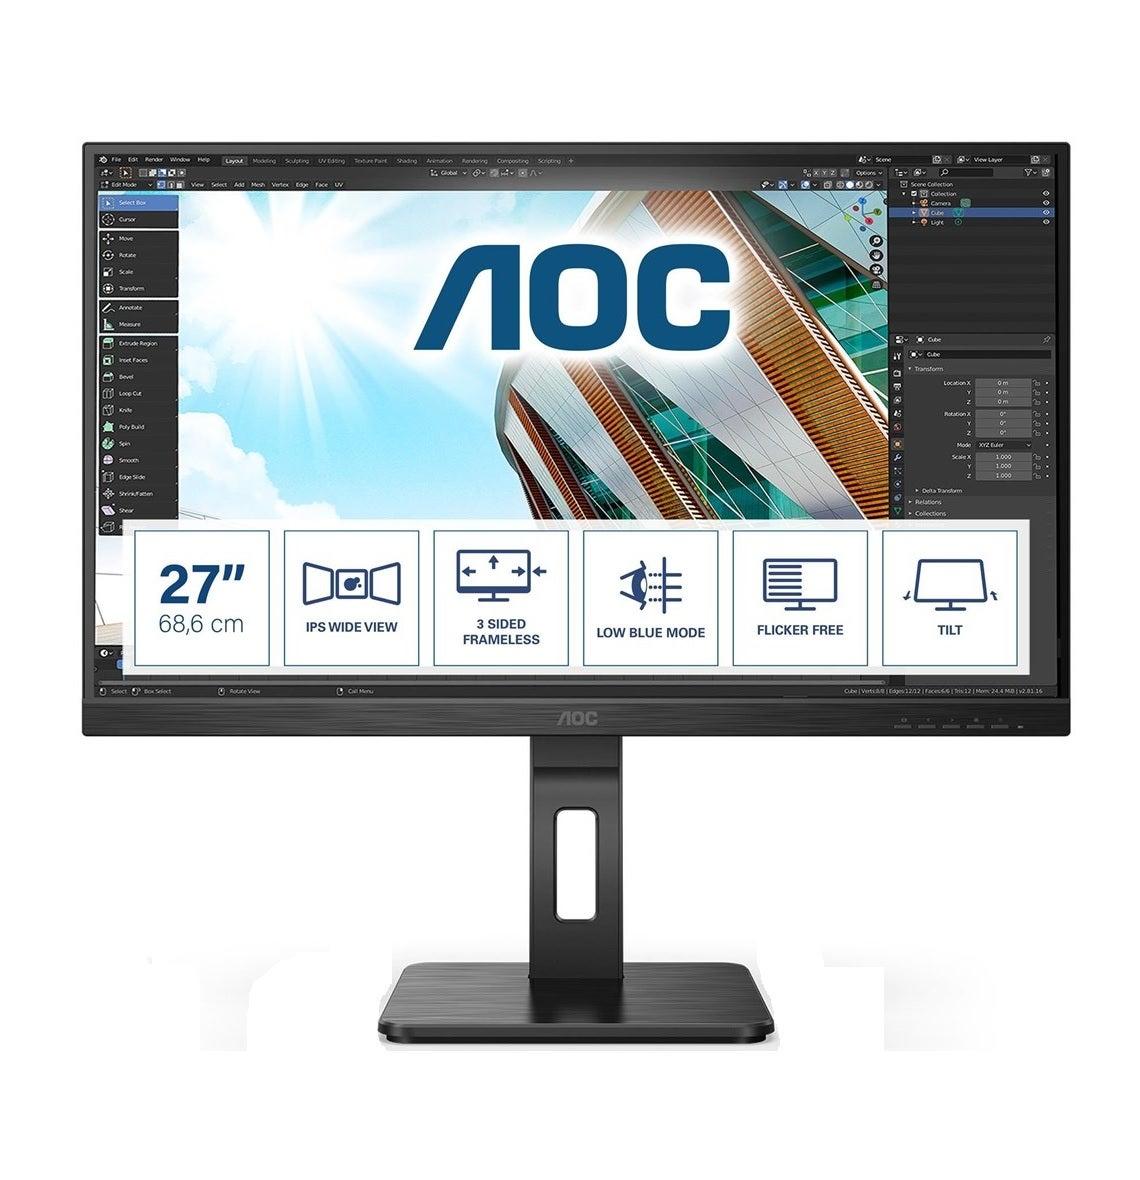 Aoc 27P2Q 27inch WLED LCD Monitor